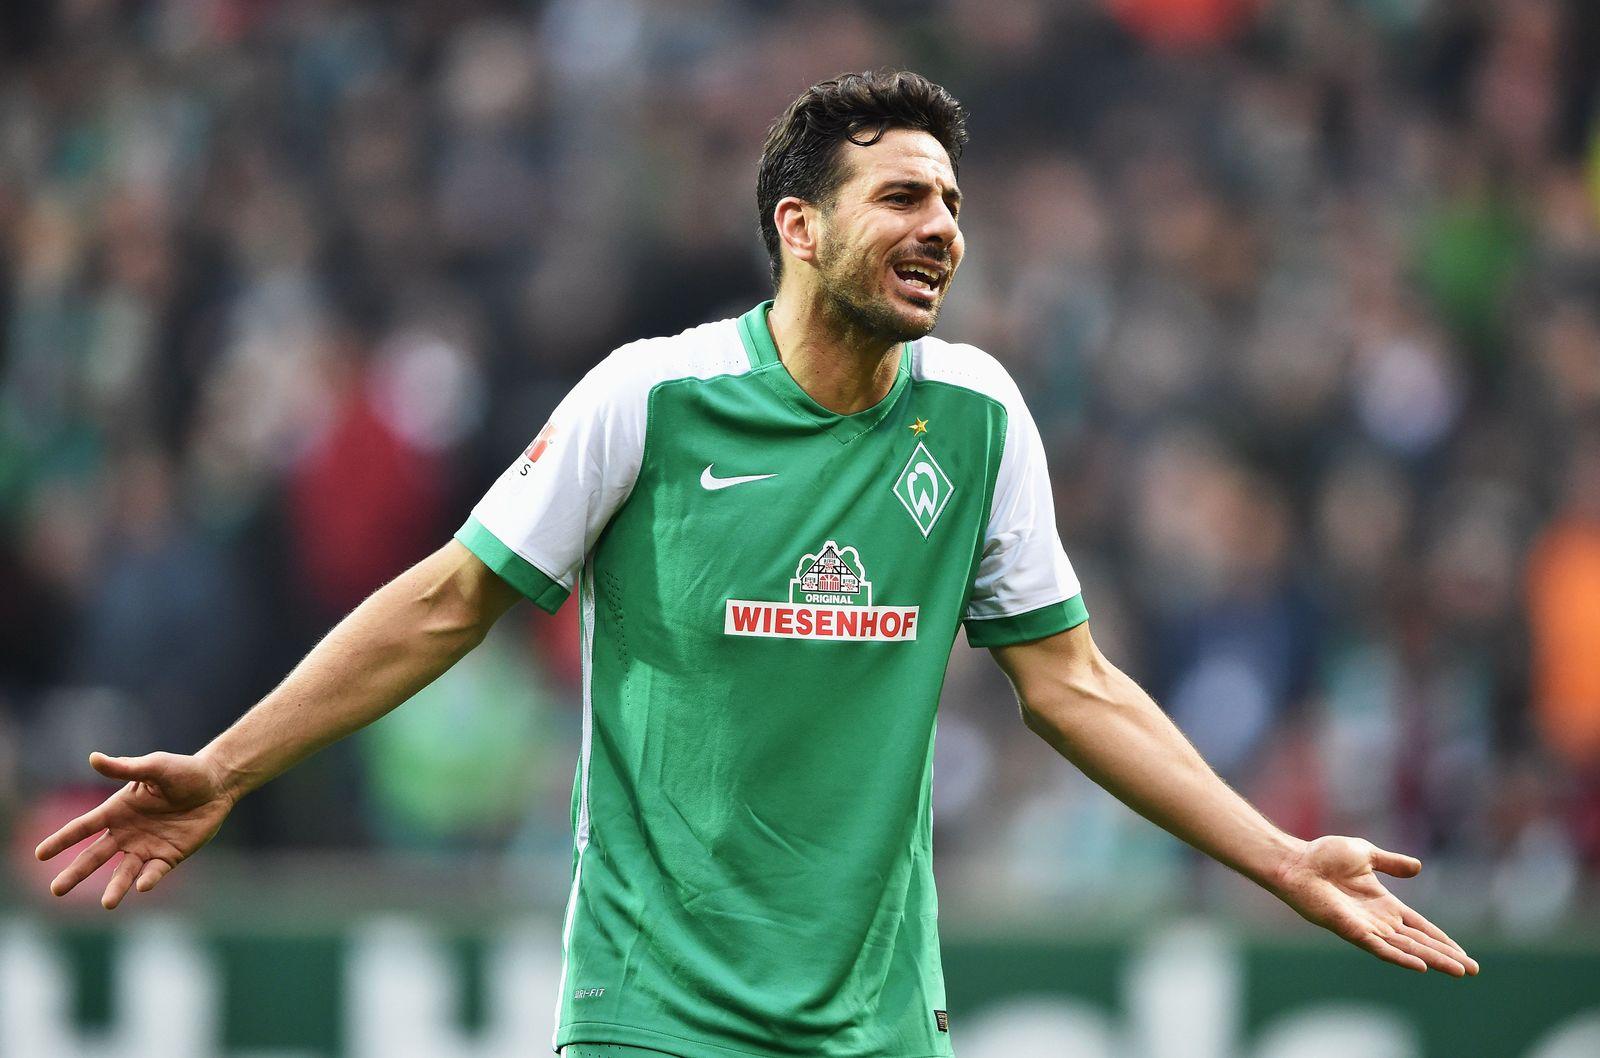 Werder Bremen Pizarro